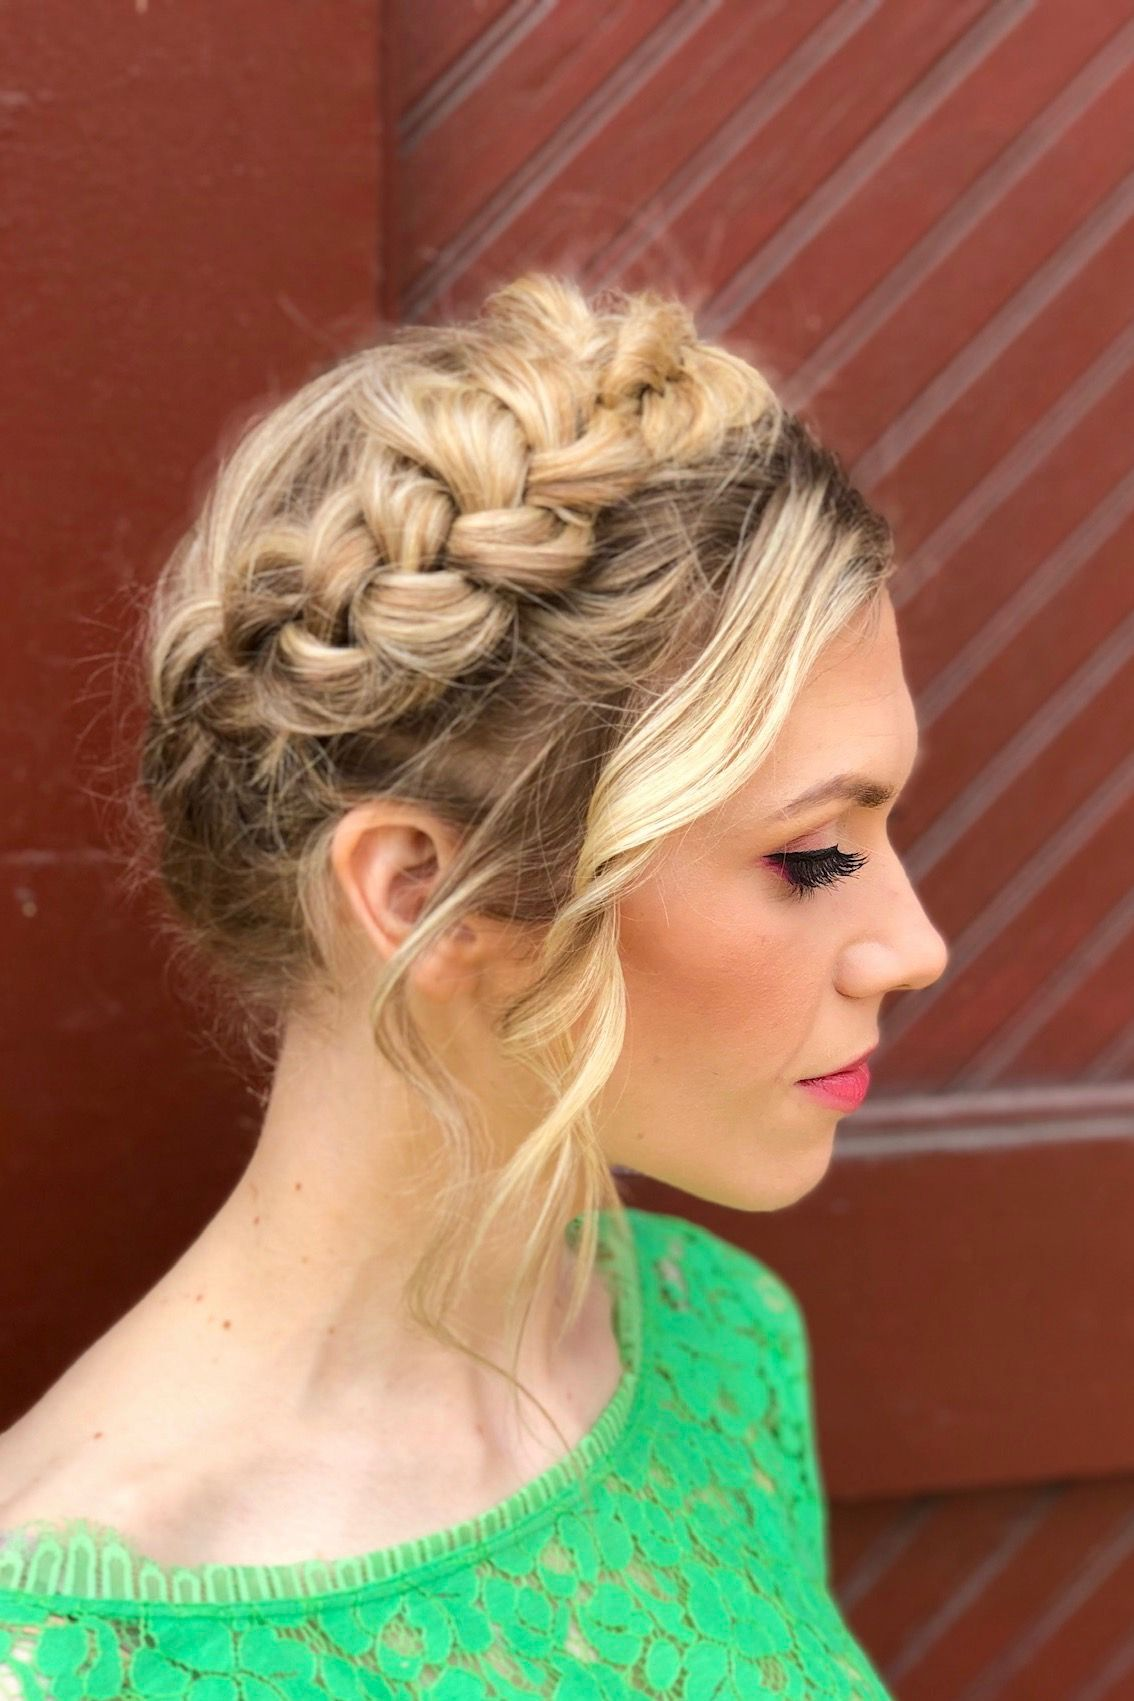 Milkmaid Braids Wavy Bangs Hairstyle Makeup By Goldplaited Braided Hairstyles Updo Hairstyles With Bangs Updo Hairstyles For Work